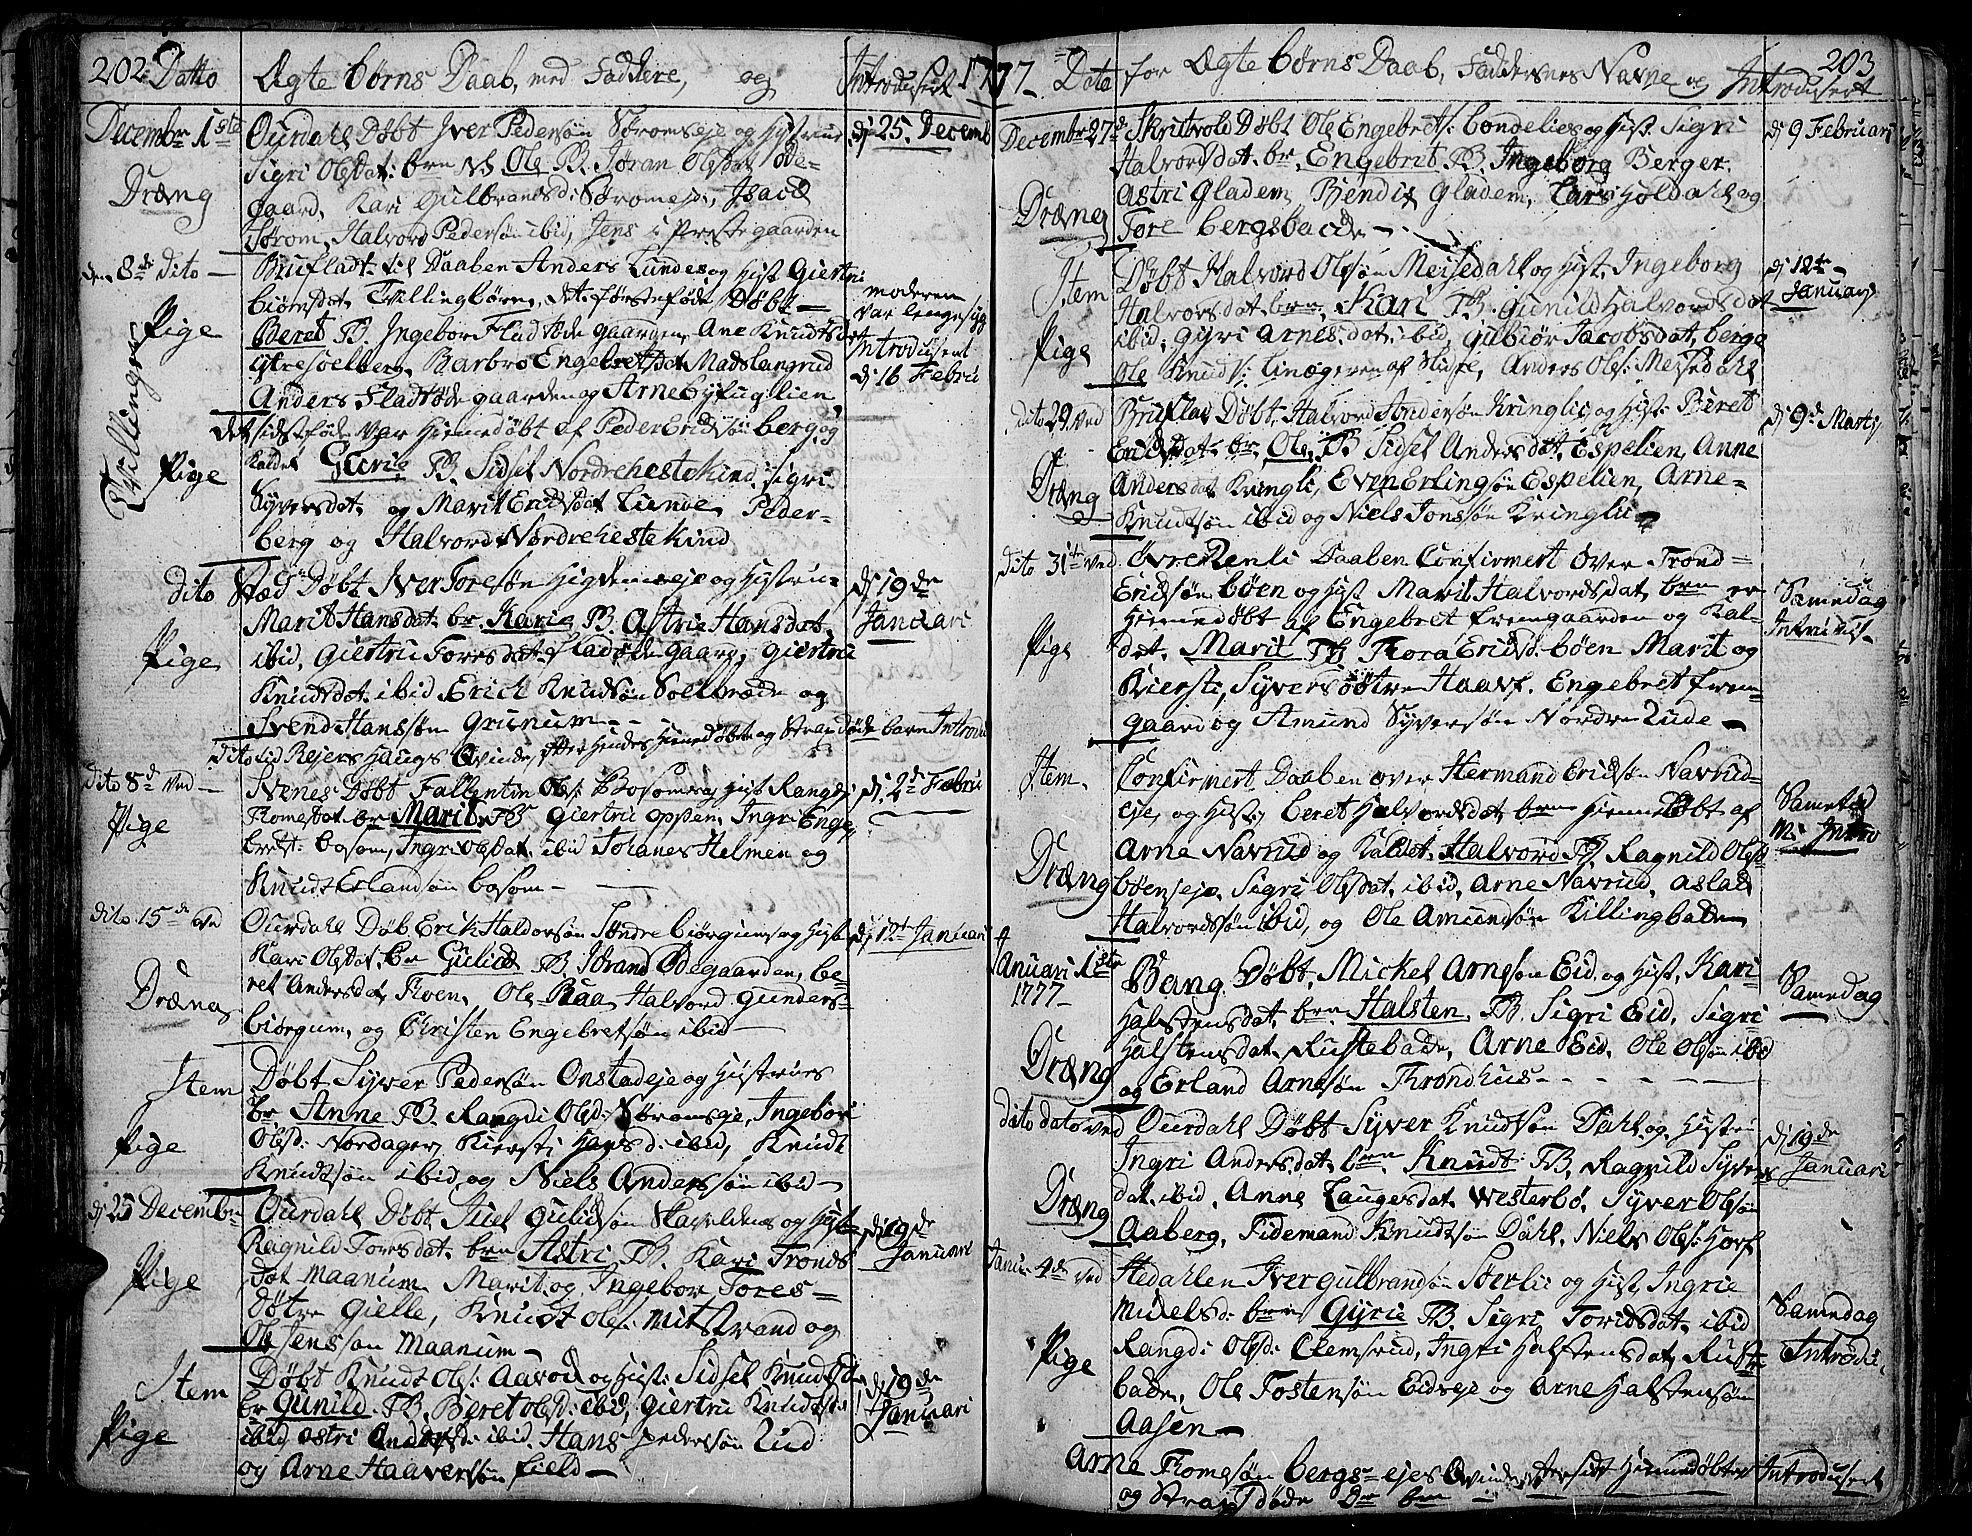 SAH, Aurdal prestekontor, Ministerialbok nr. 5, 1763-1781, s. 202-203